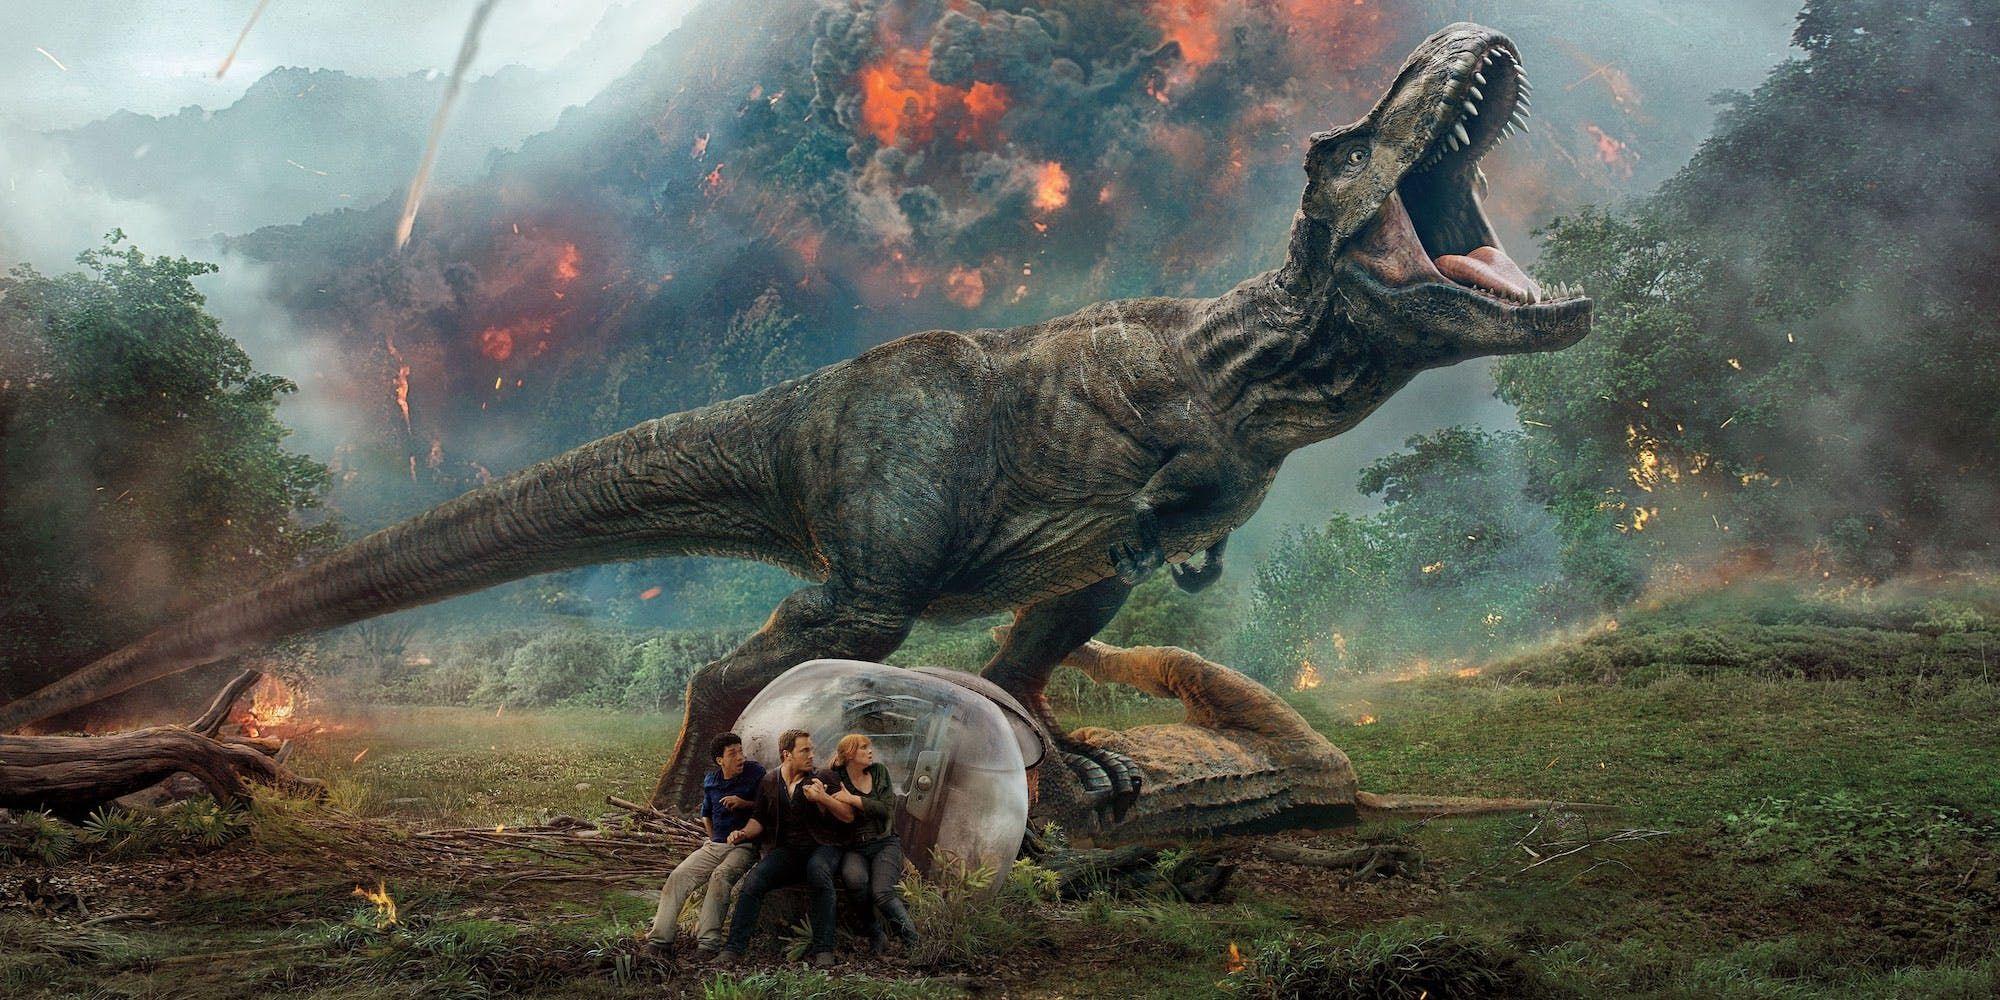 Jurassic World Fallen Kingdom Review A Thrilling New Chapter Jurassic World Ganze Filme Filme